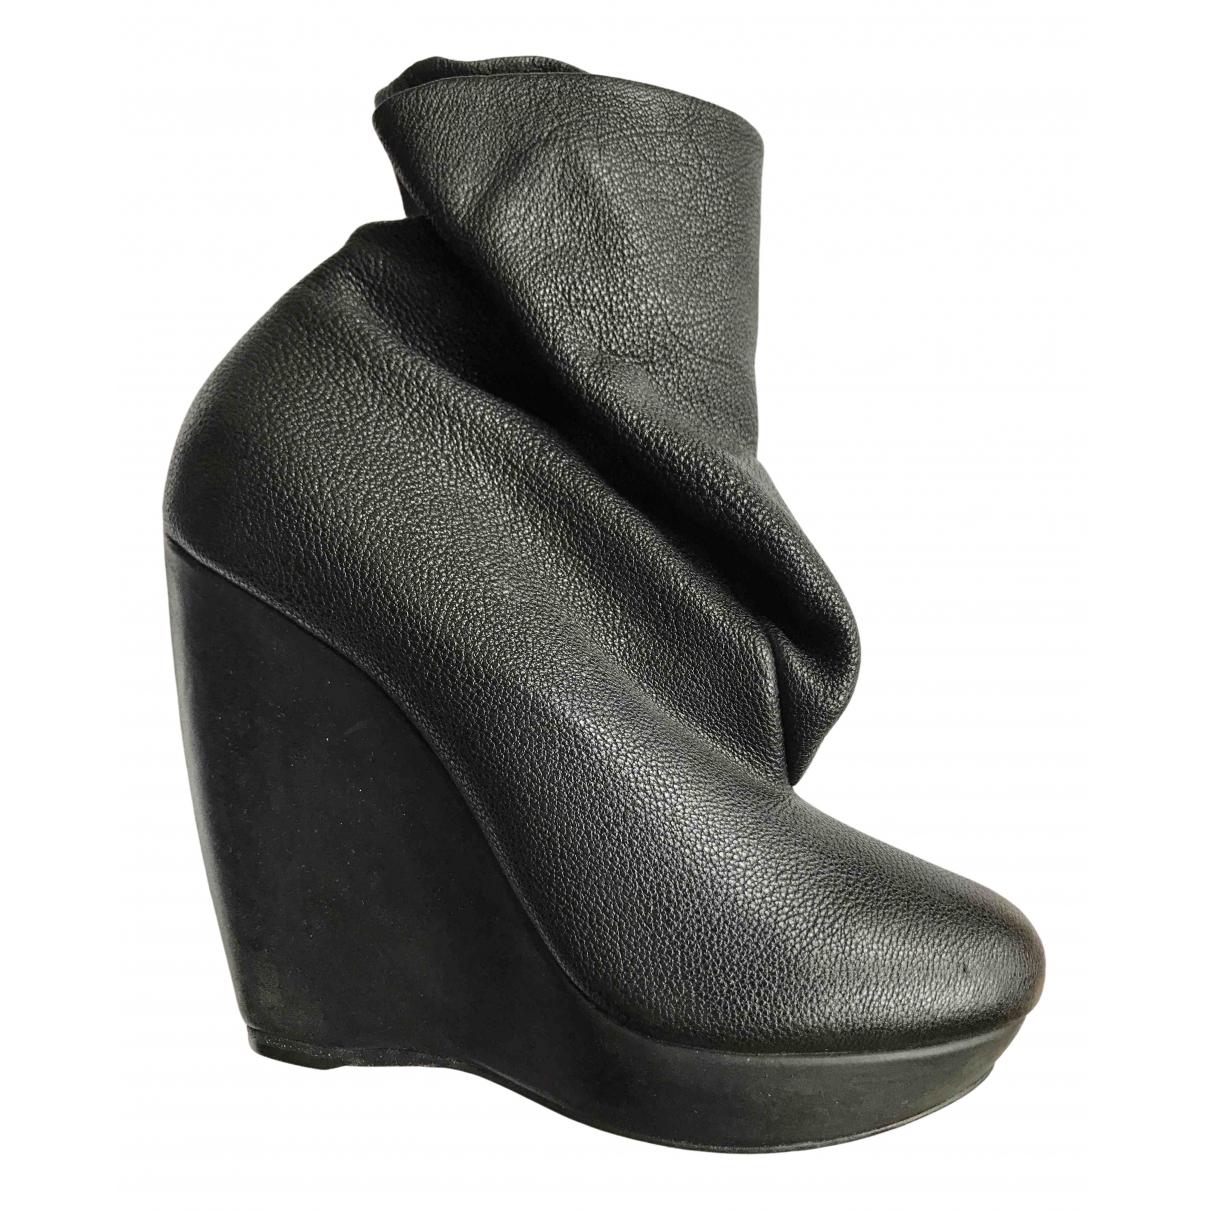 Balenciaga N Black Leather Ankle boots for Women 37 EU